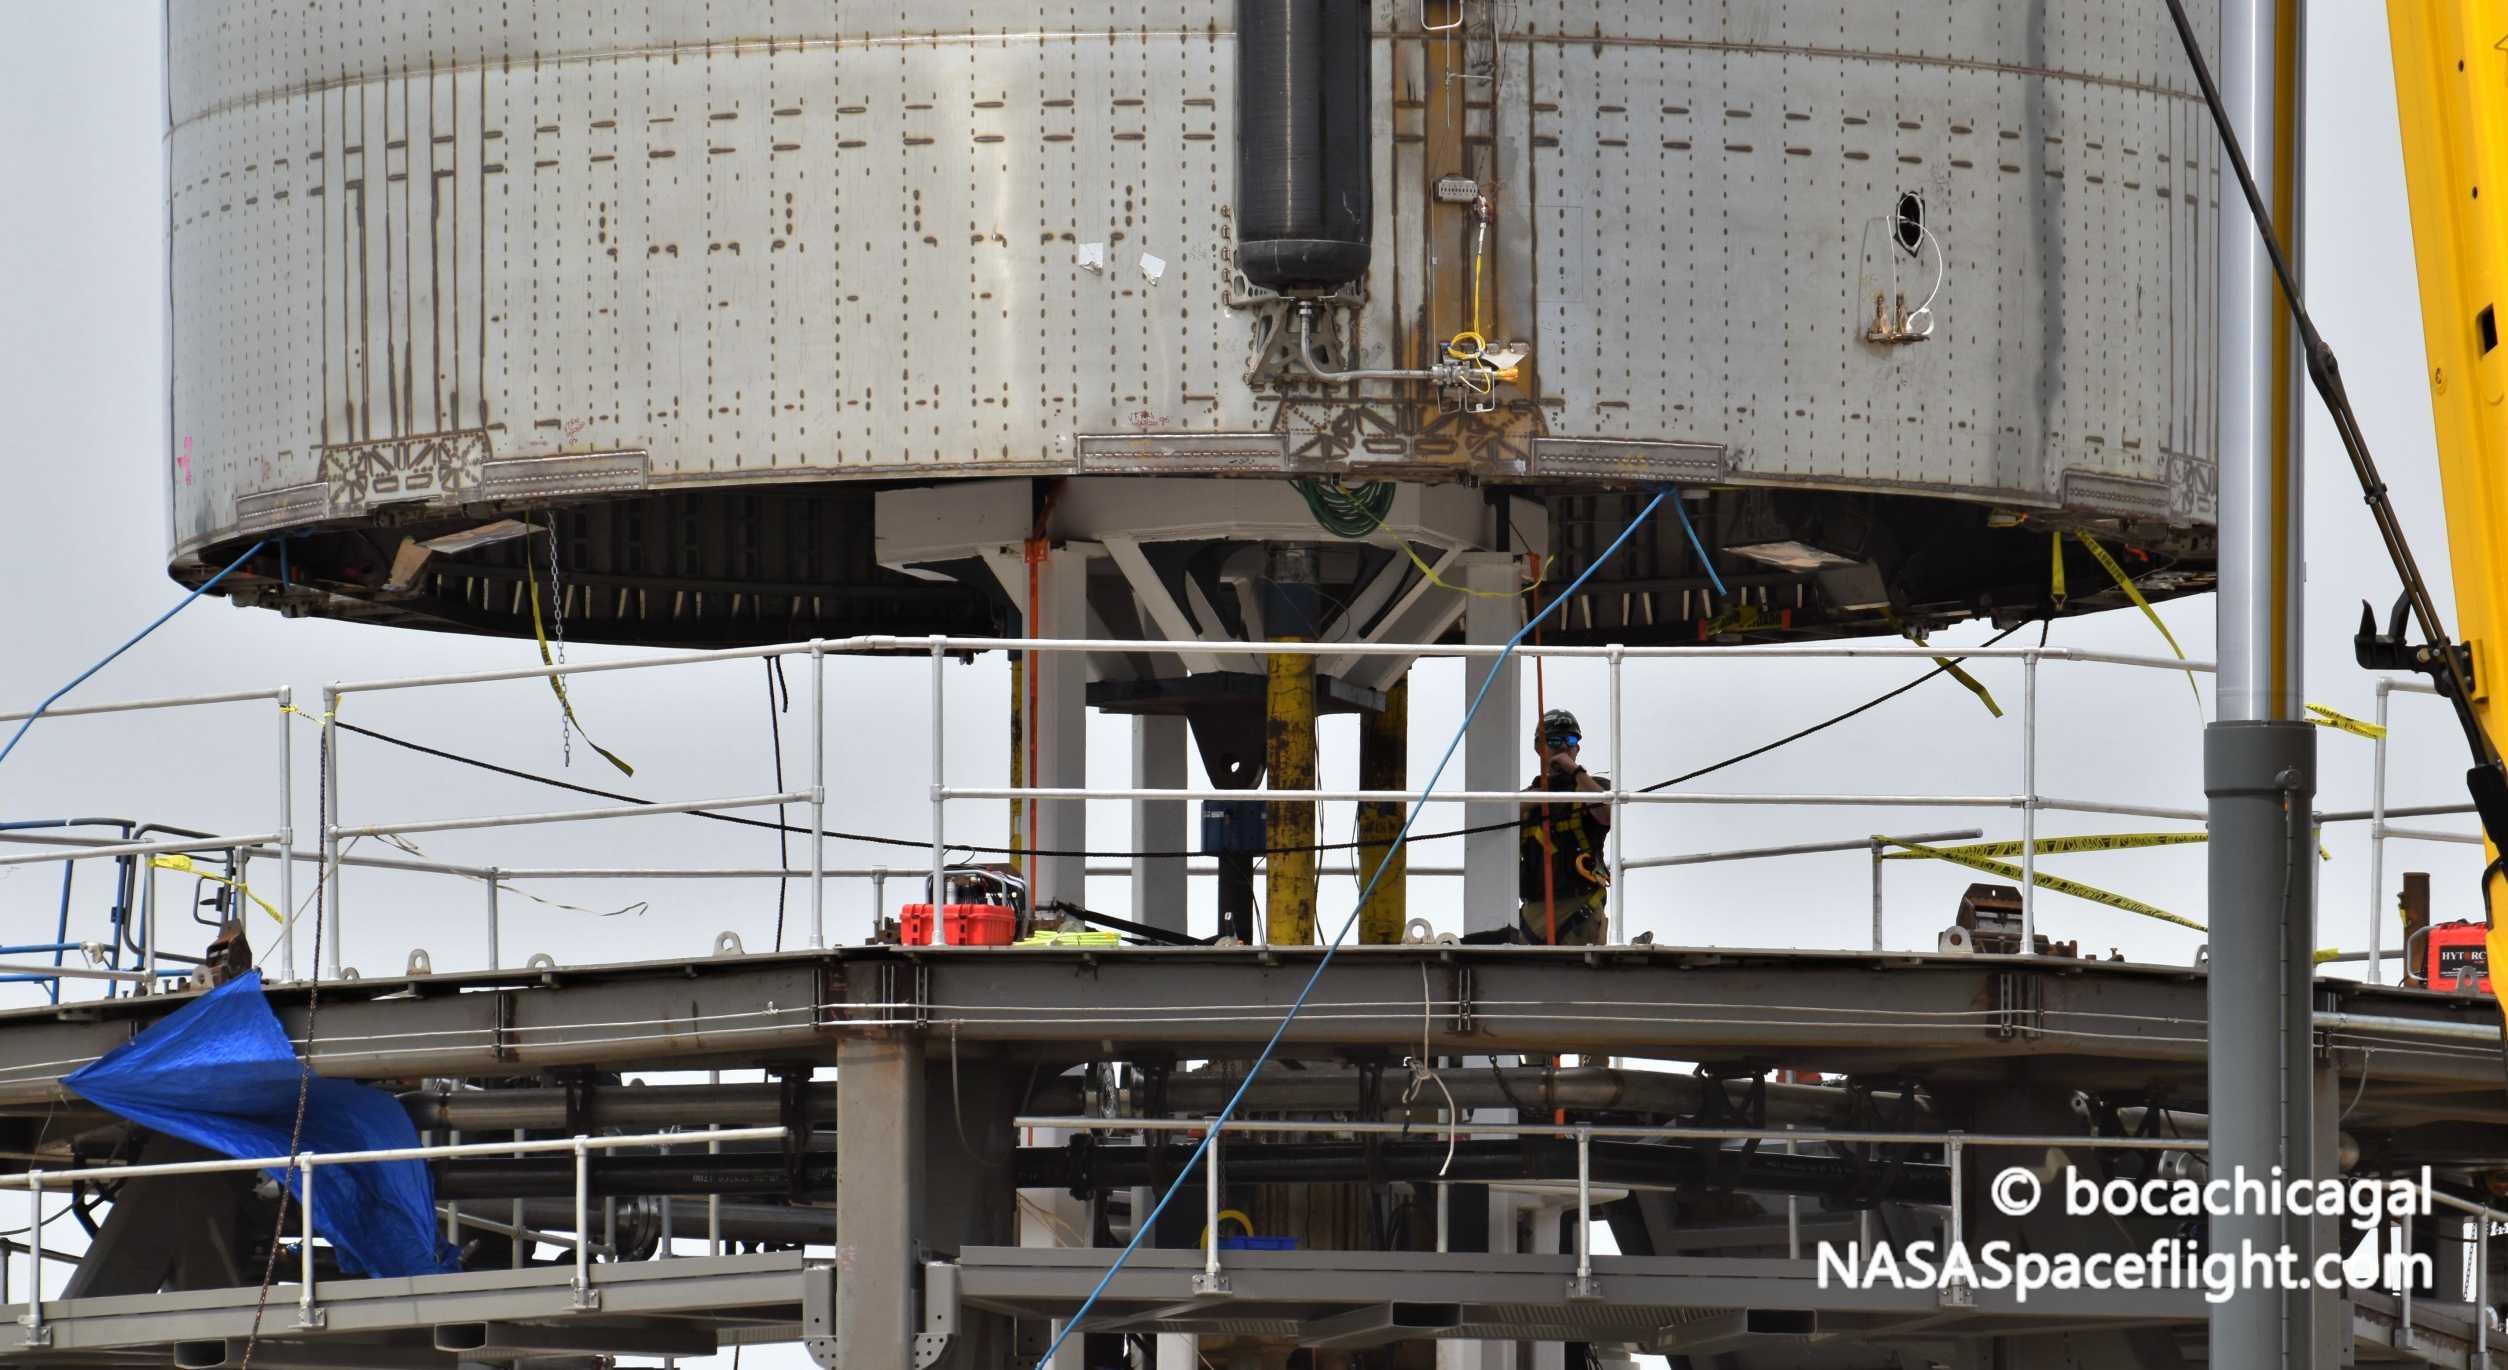 Starship Boca Chica 062420 (NASASpaceflight – bocachicagal) SN5 mount install 9 crop (c)